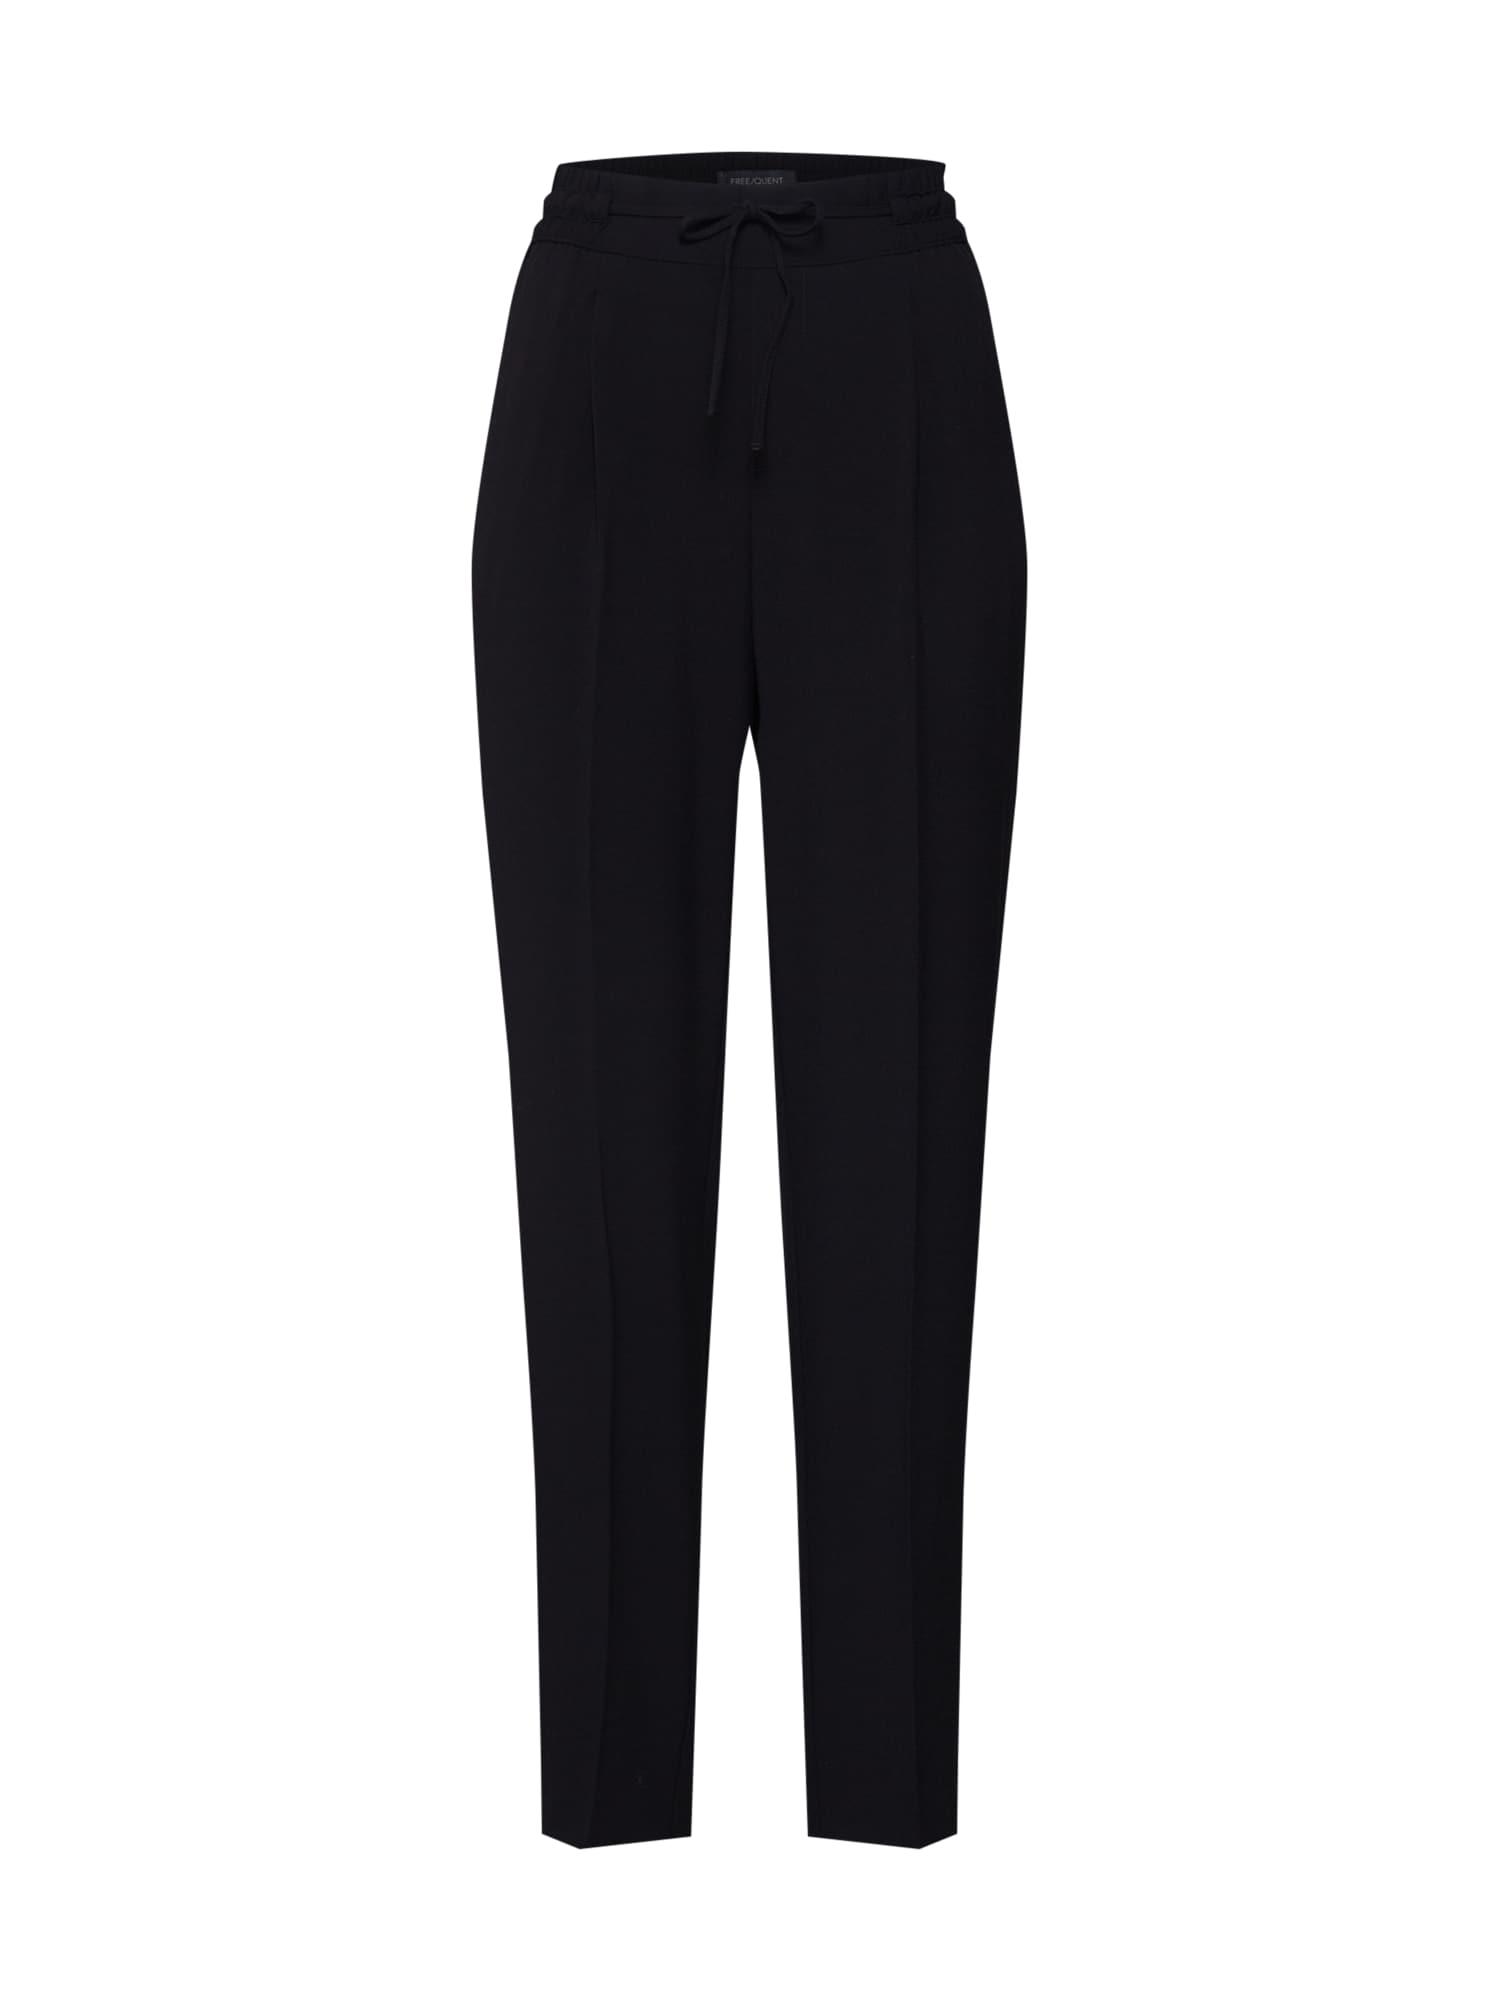 Freequent Chino stiliaus kelnės 'FQLIZY-PA' juoda